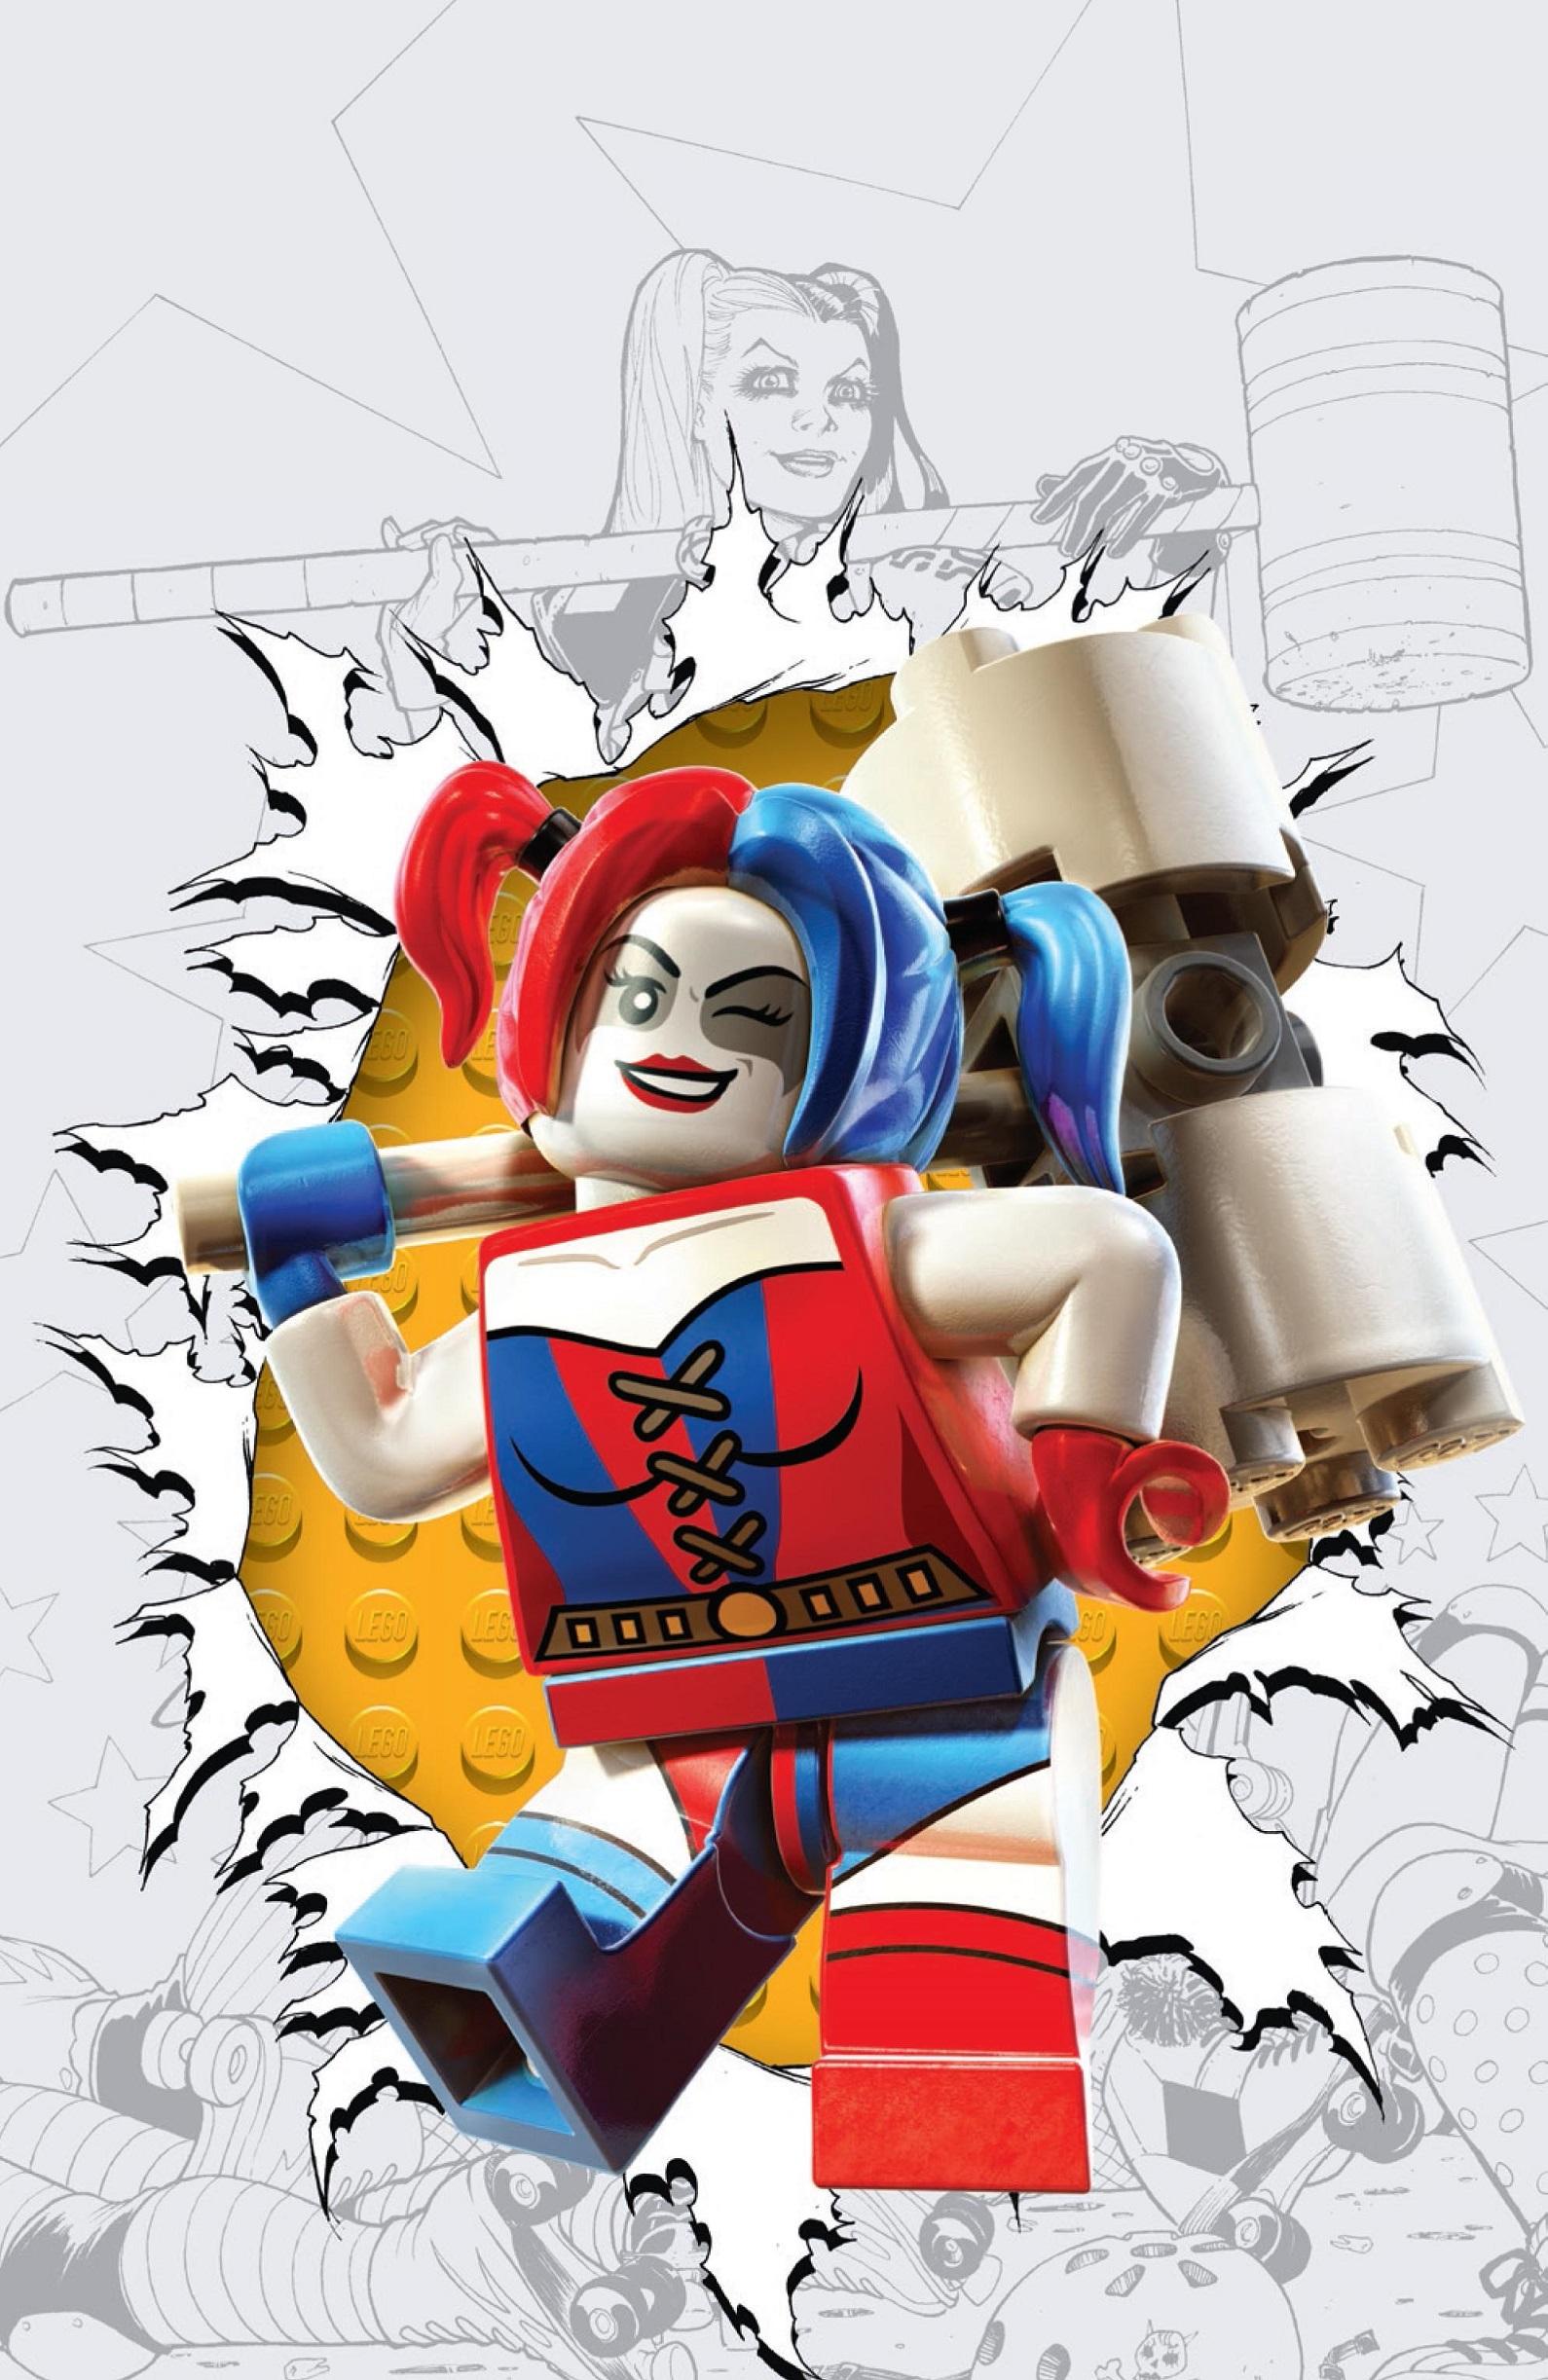 Harley Quinn Vol 2 12 Textless Lego Variant.jpg